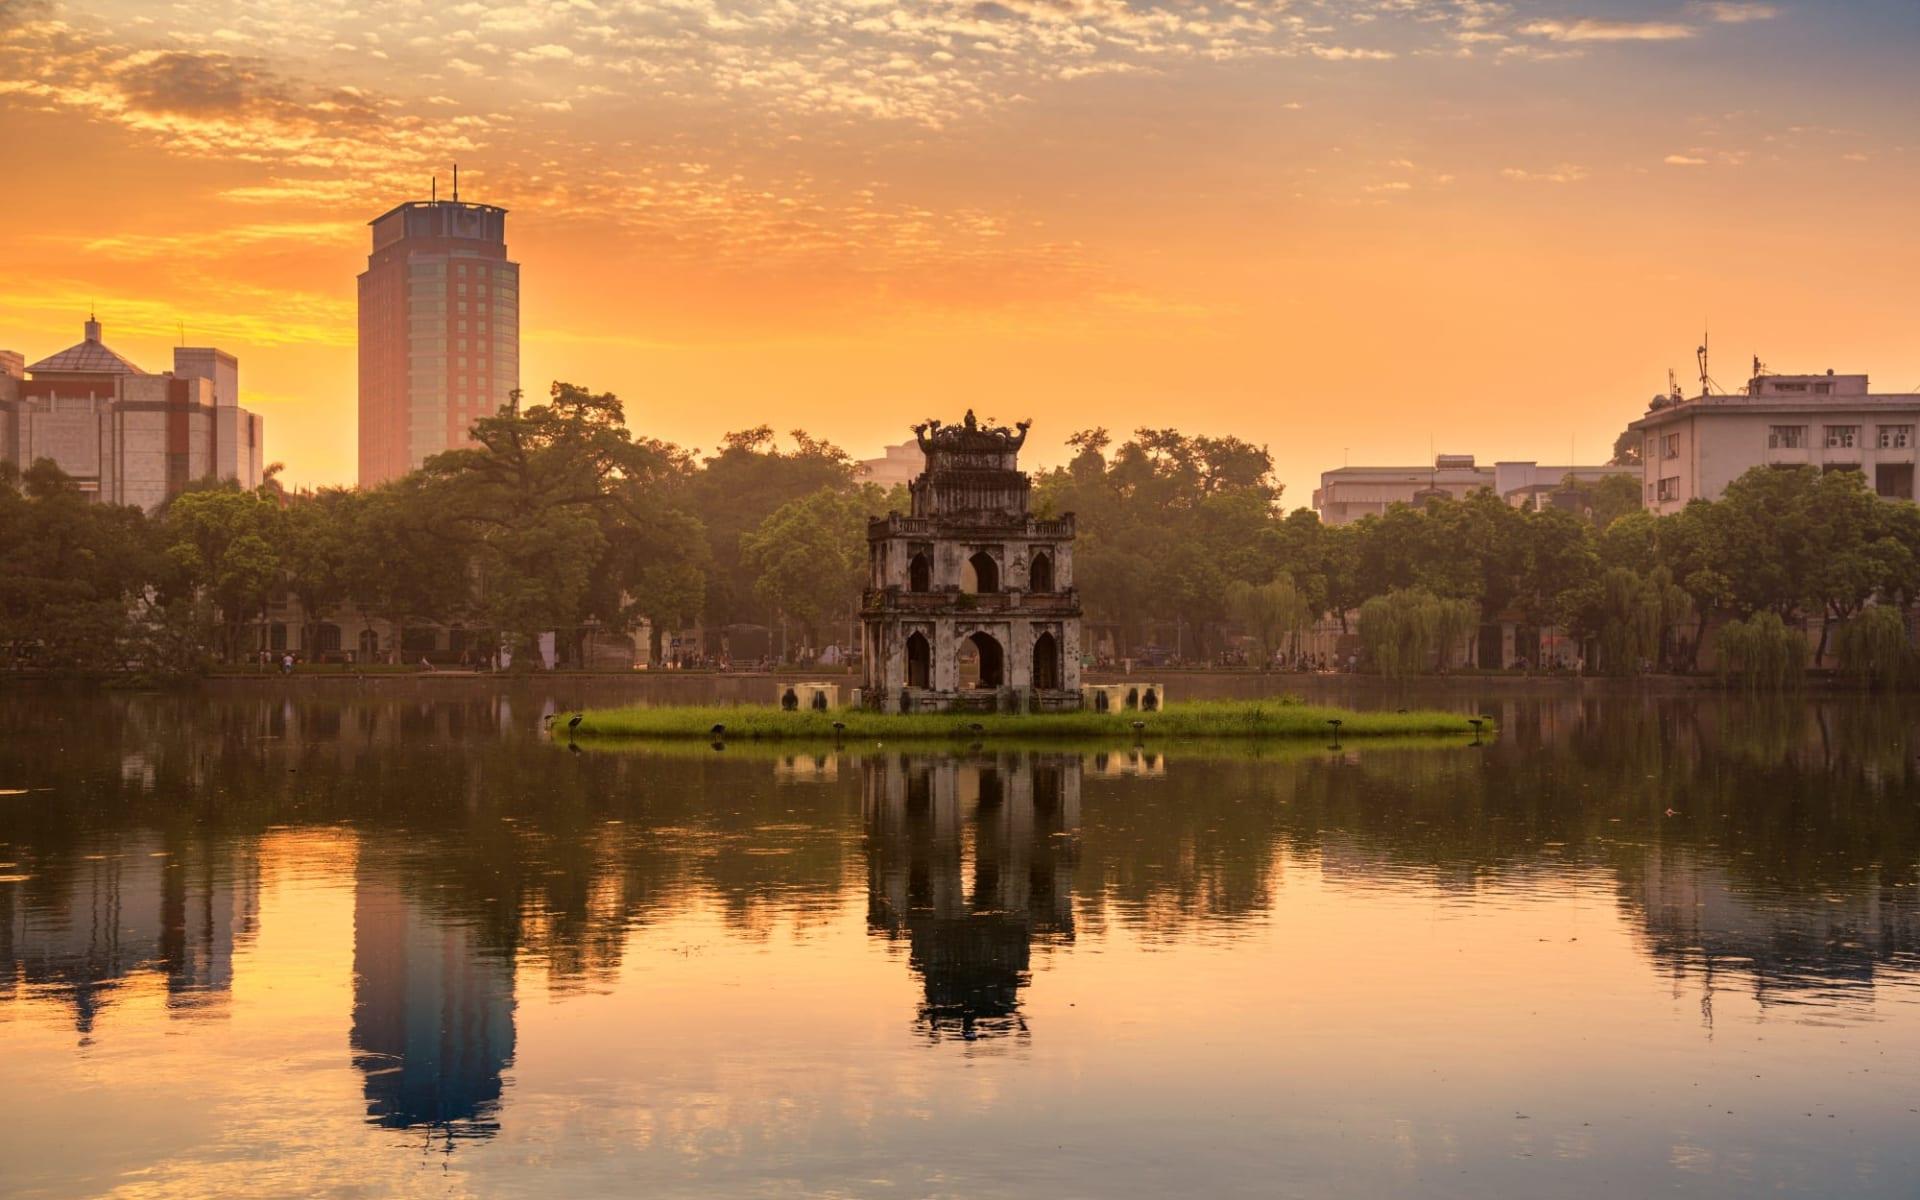 Glanzlichter Vietnam - von Saigon nach Hanoi: Hanoi Hoan Kiem Lake (Lake of the Returned Sword) and the Turtle Tower